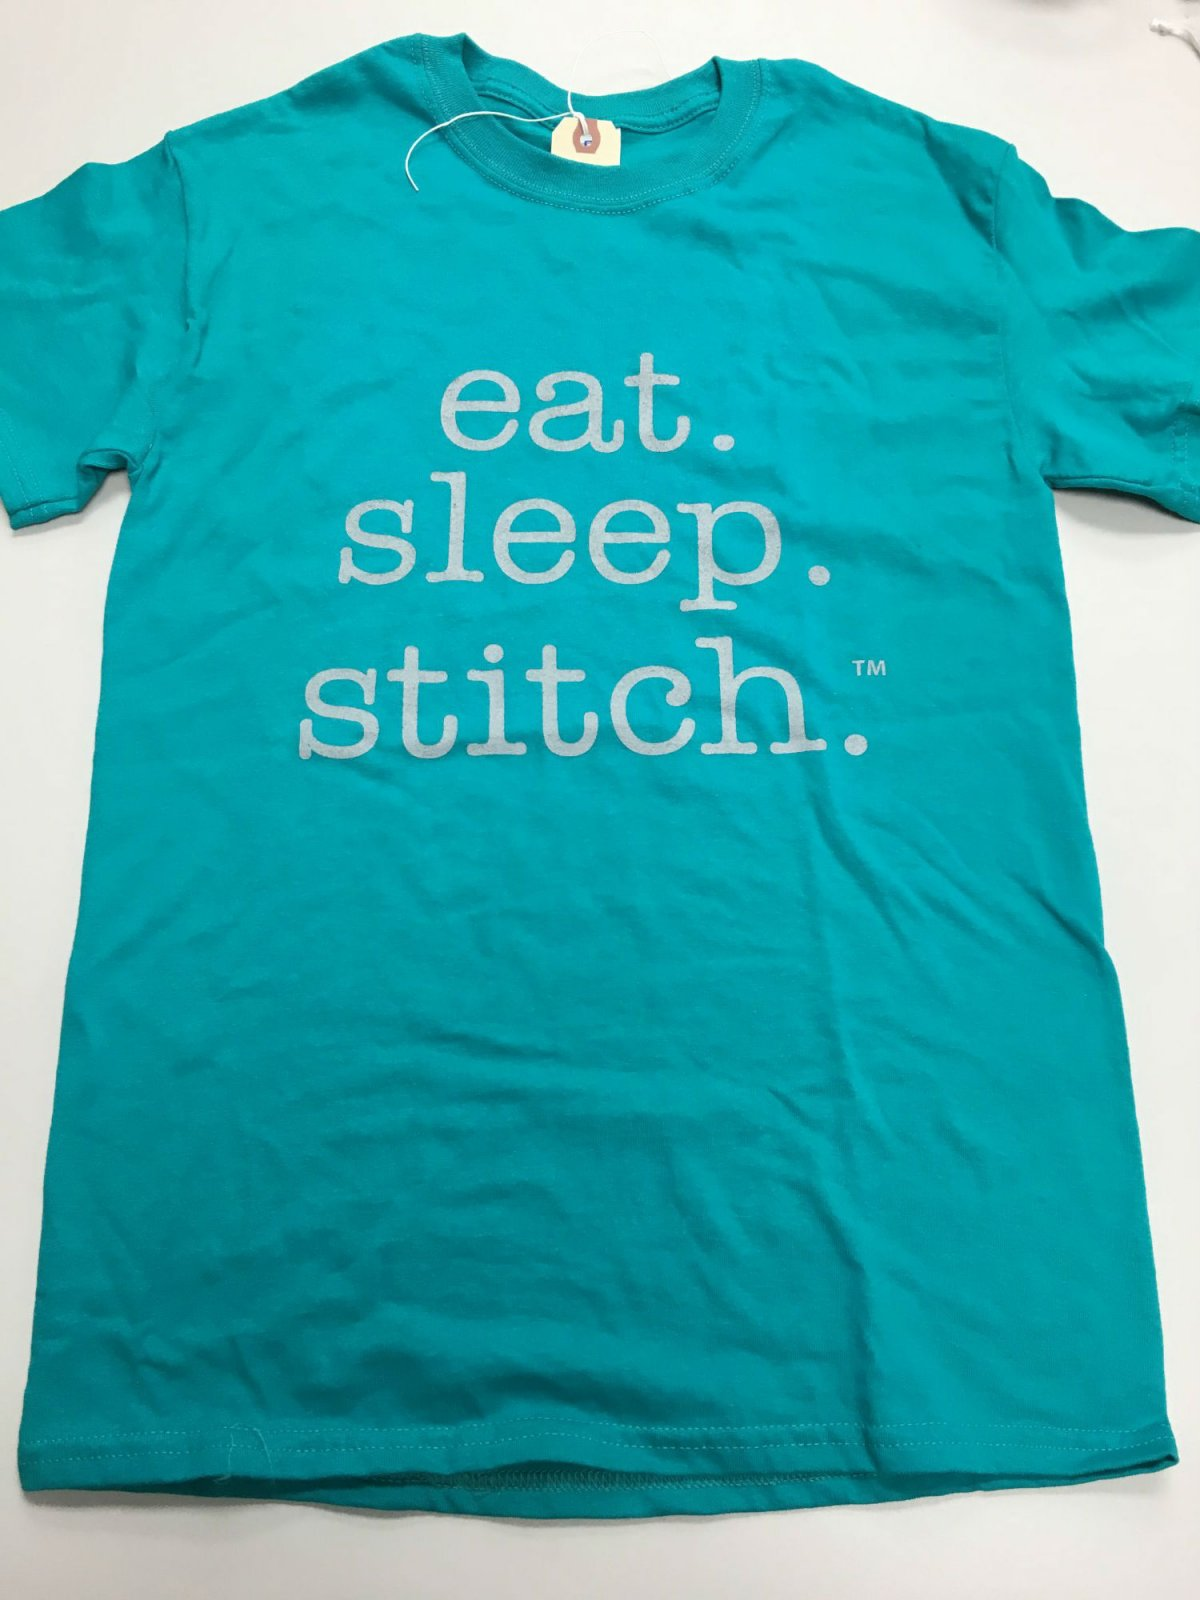 eat sleep stitch sleep shirt one size teal